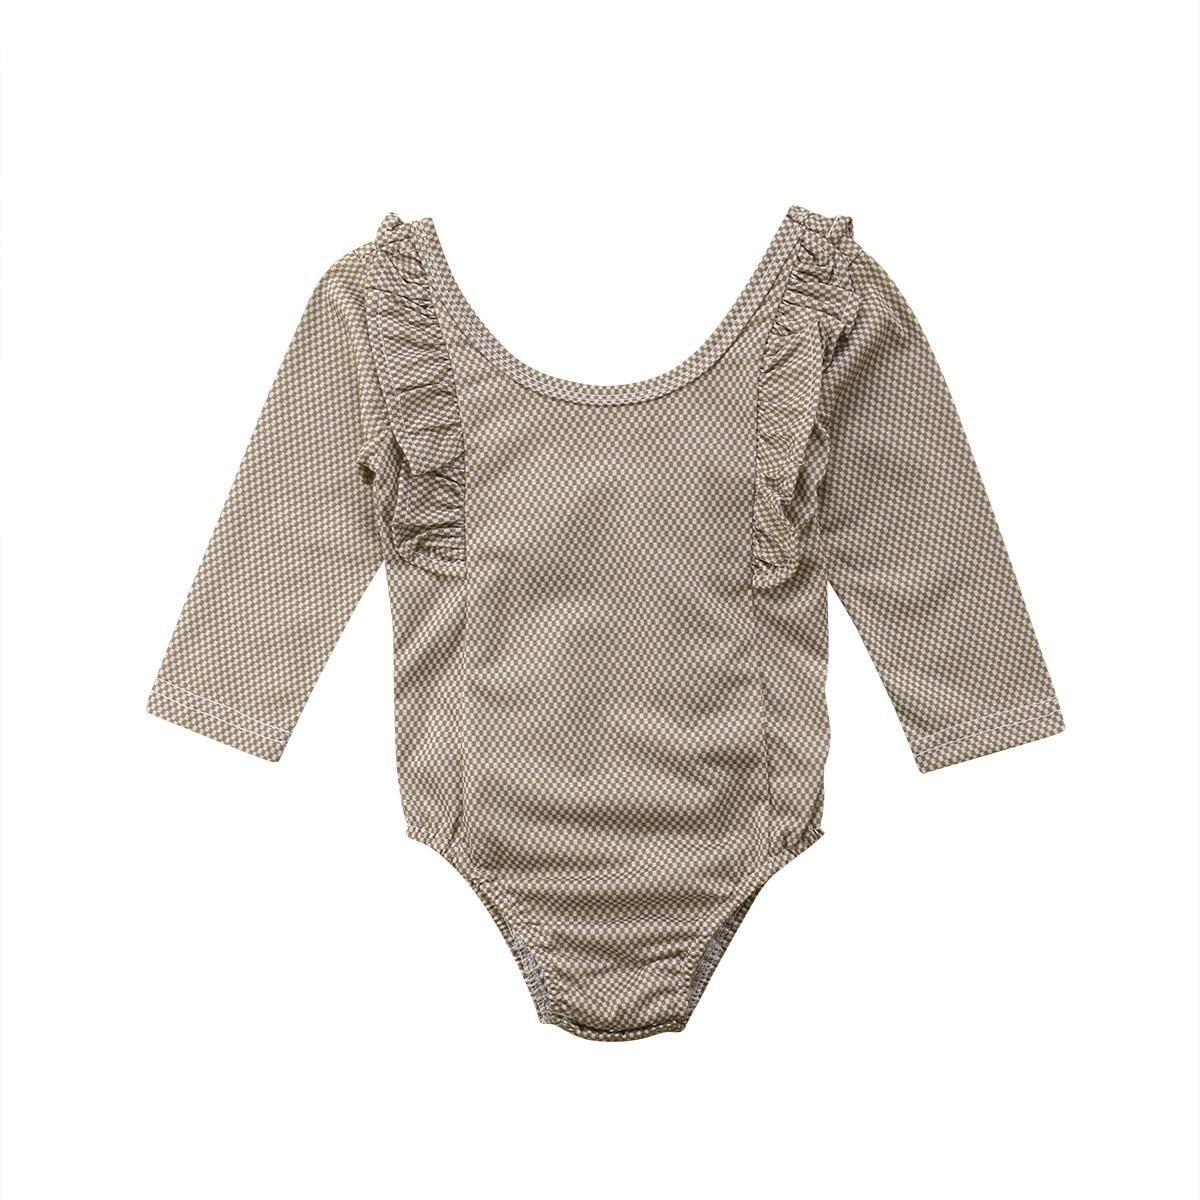 0-24 M Mooie Causale Pasgeboren Peuter Baby Meisjes Bodysuits Lange Mouwen Plaid Ruches Bruin Jumpsuits Bodysuit Sunsuit Baby Kleding Hoge Veerkracht